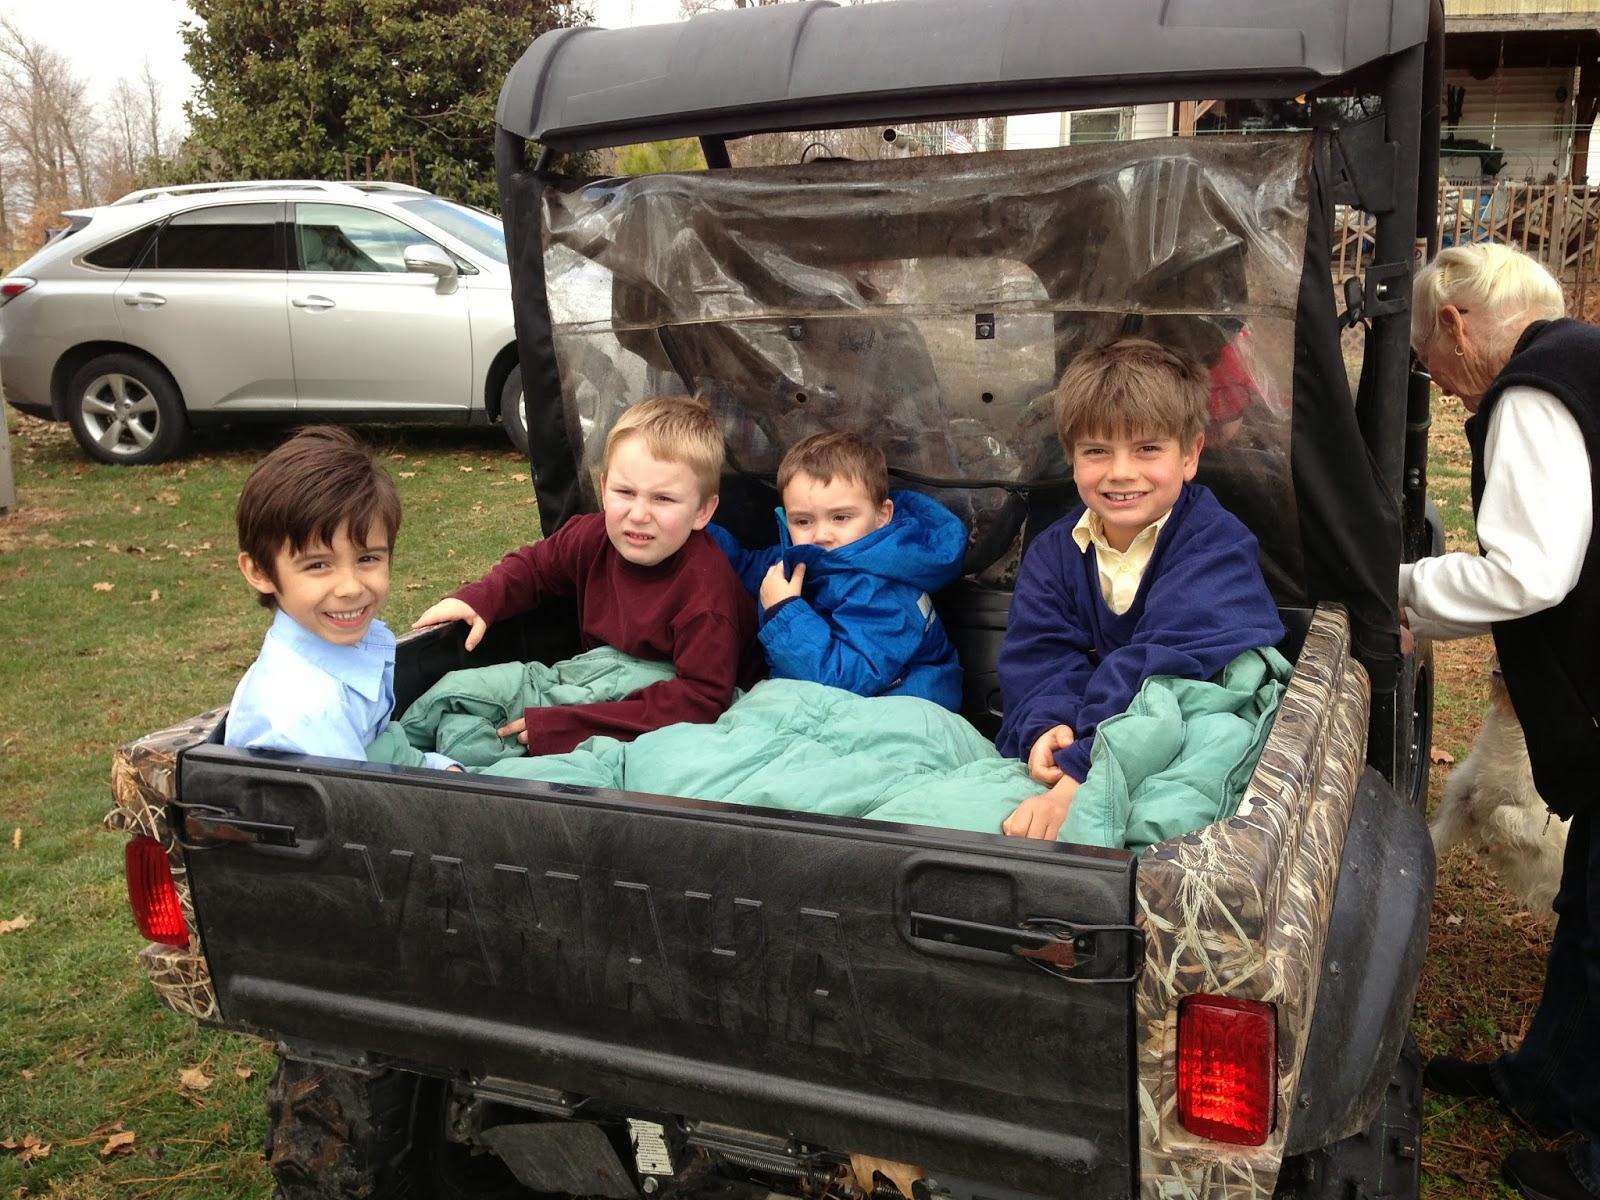 farm, off-road vehicle, boys smiling